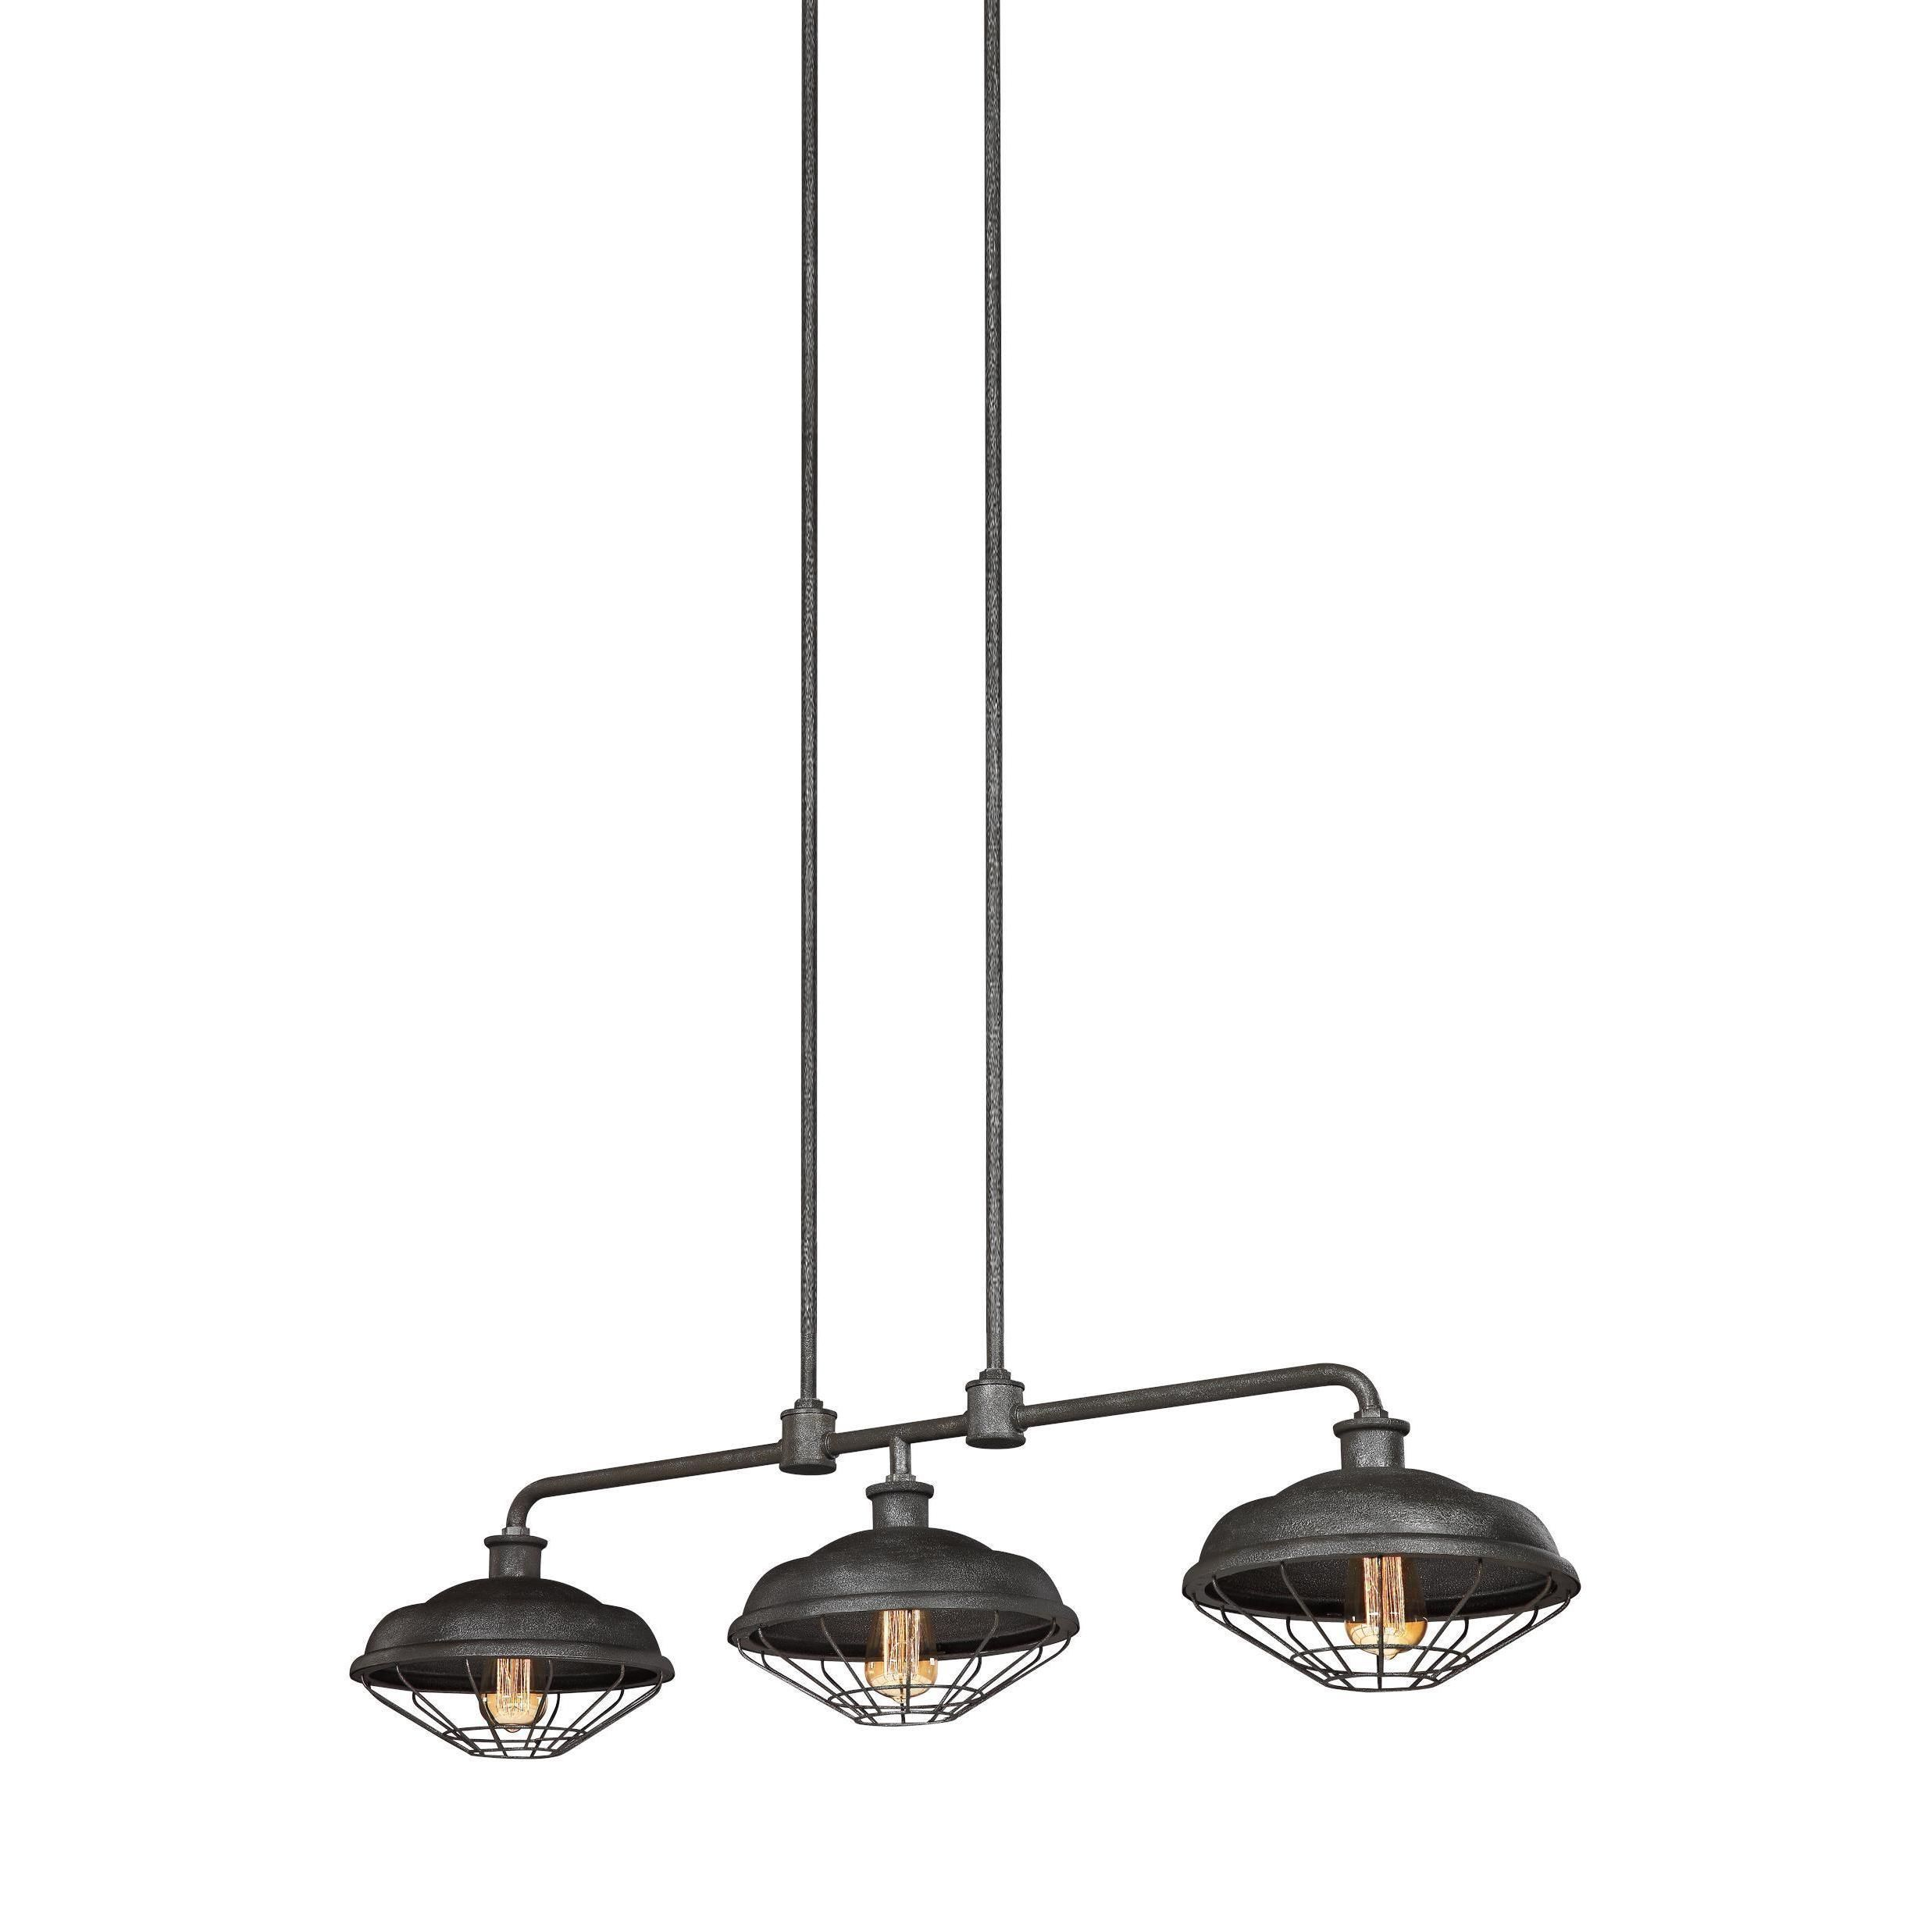 Feiss lennex light slated grey metal chandelier light island